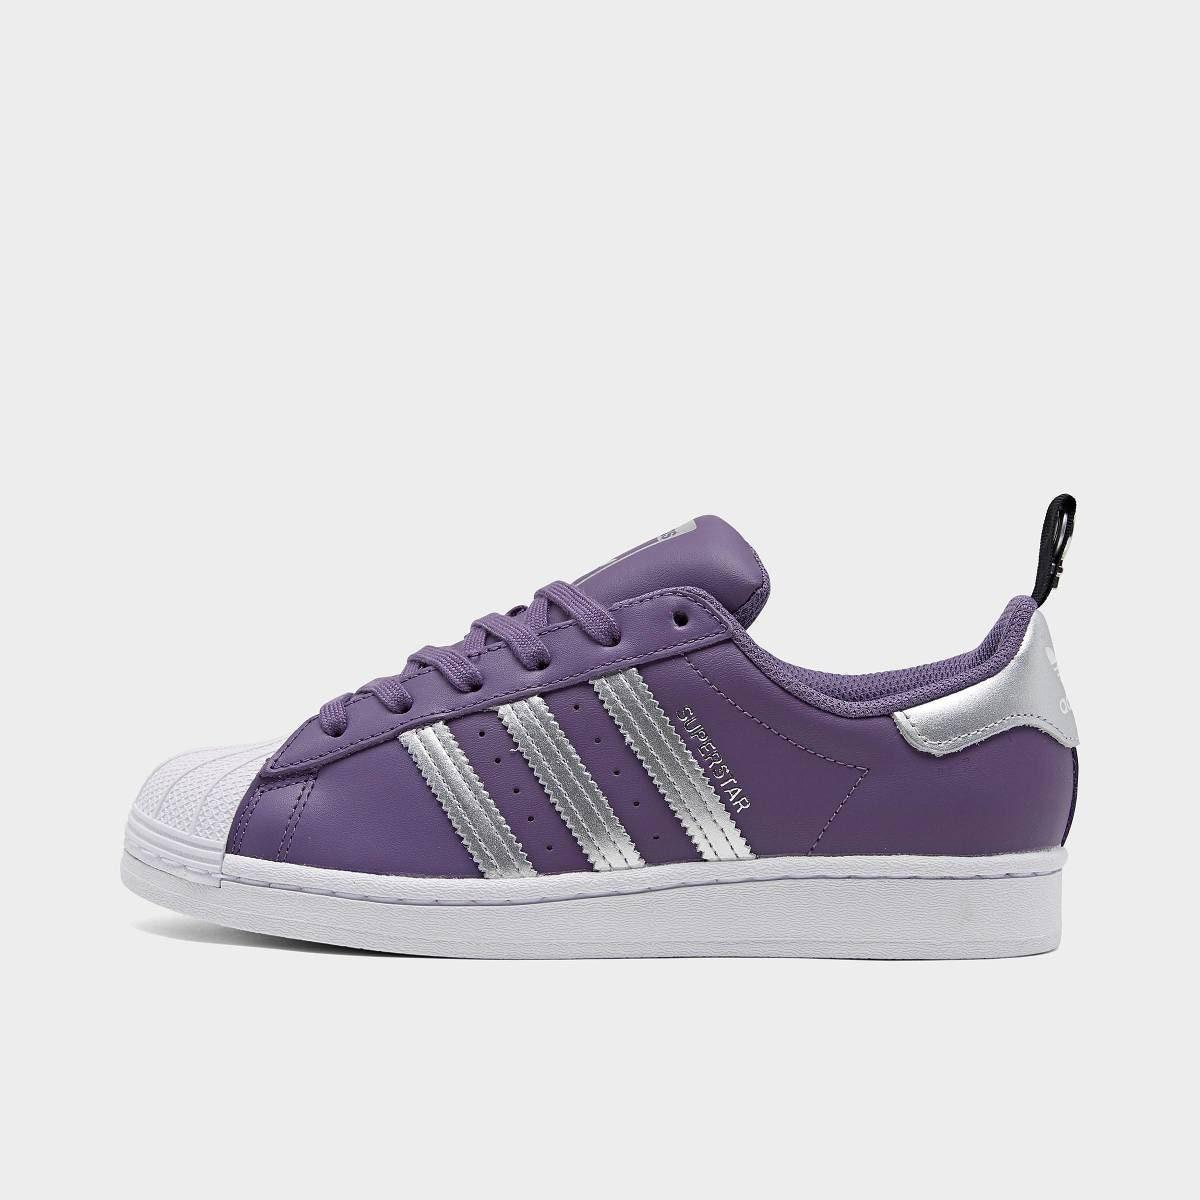 Swarovski Women's Adidas Originals Superstar Purple Sneakers ...